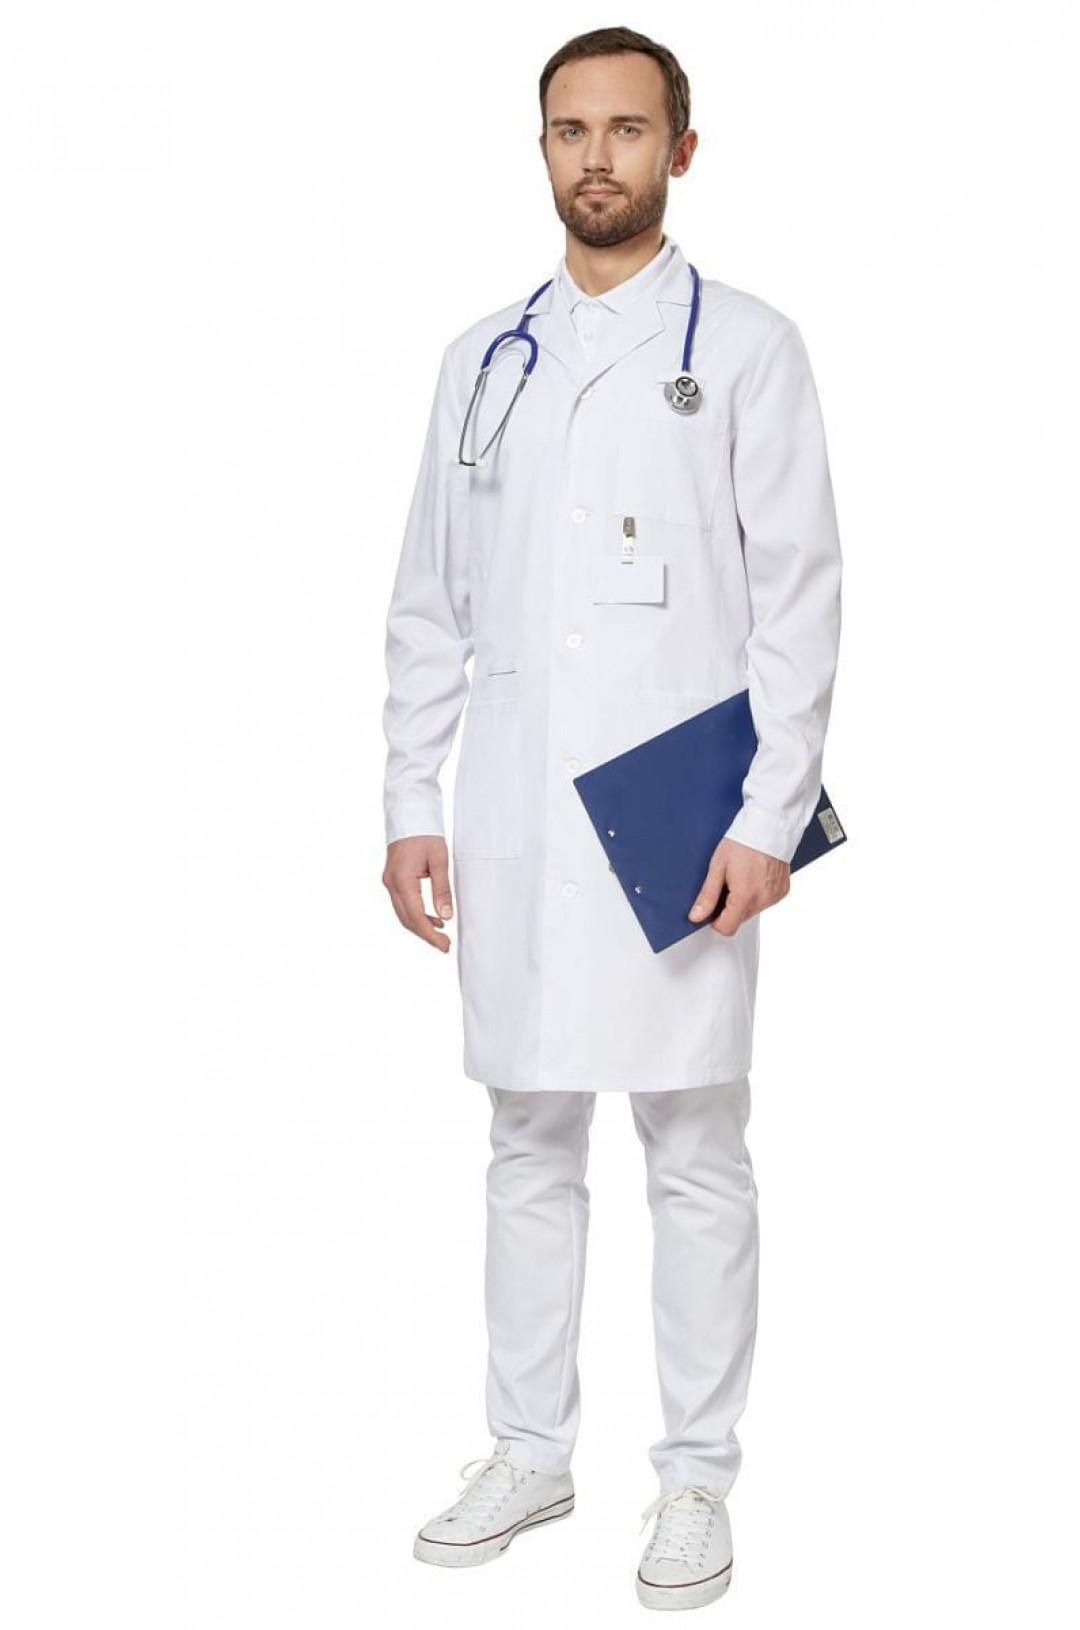 Халат мужской медицинский LL 1202 (белый, сатори)